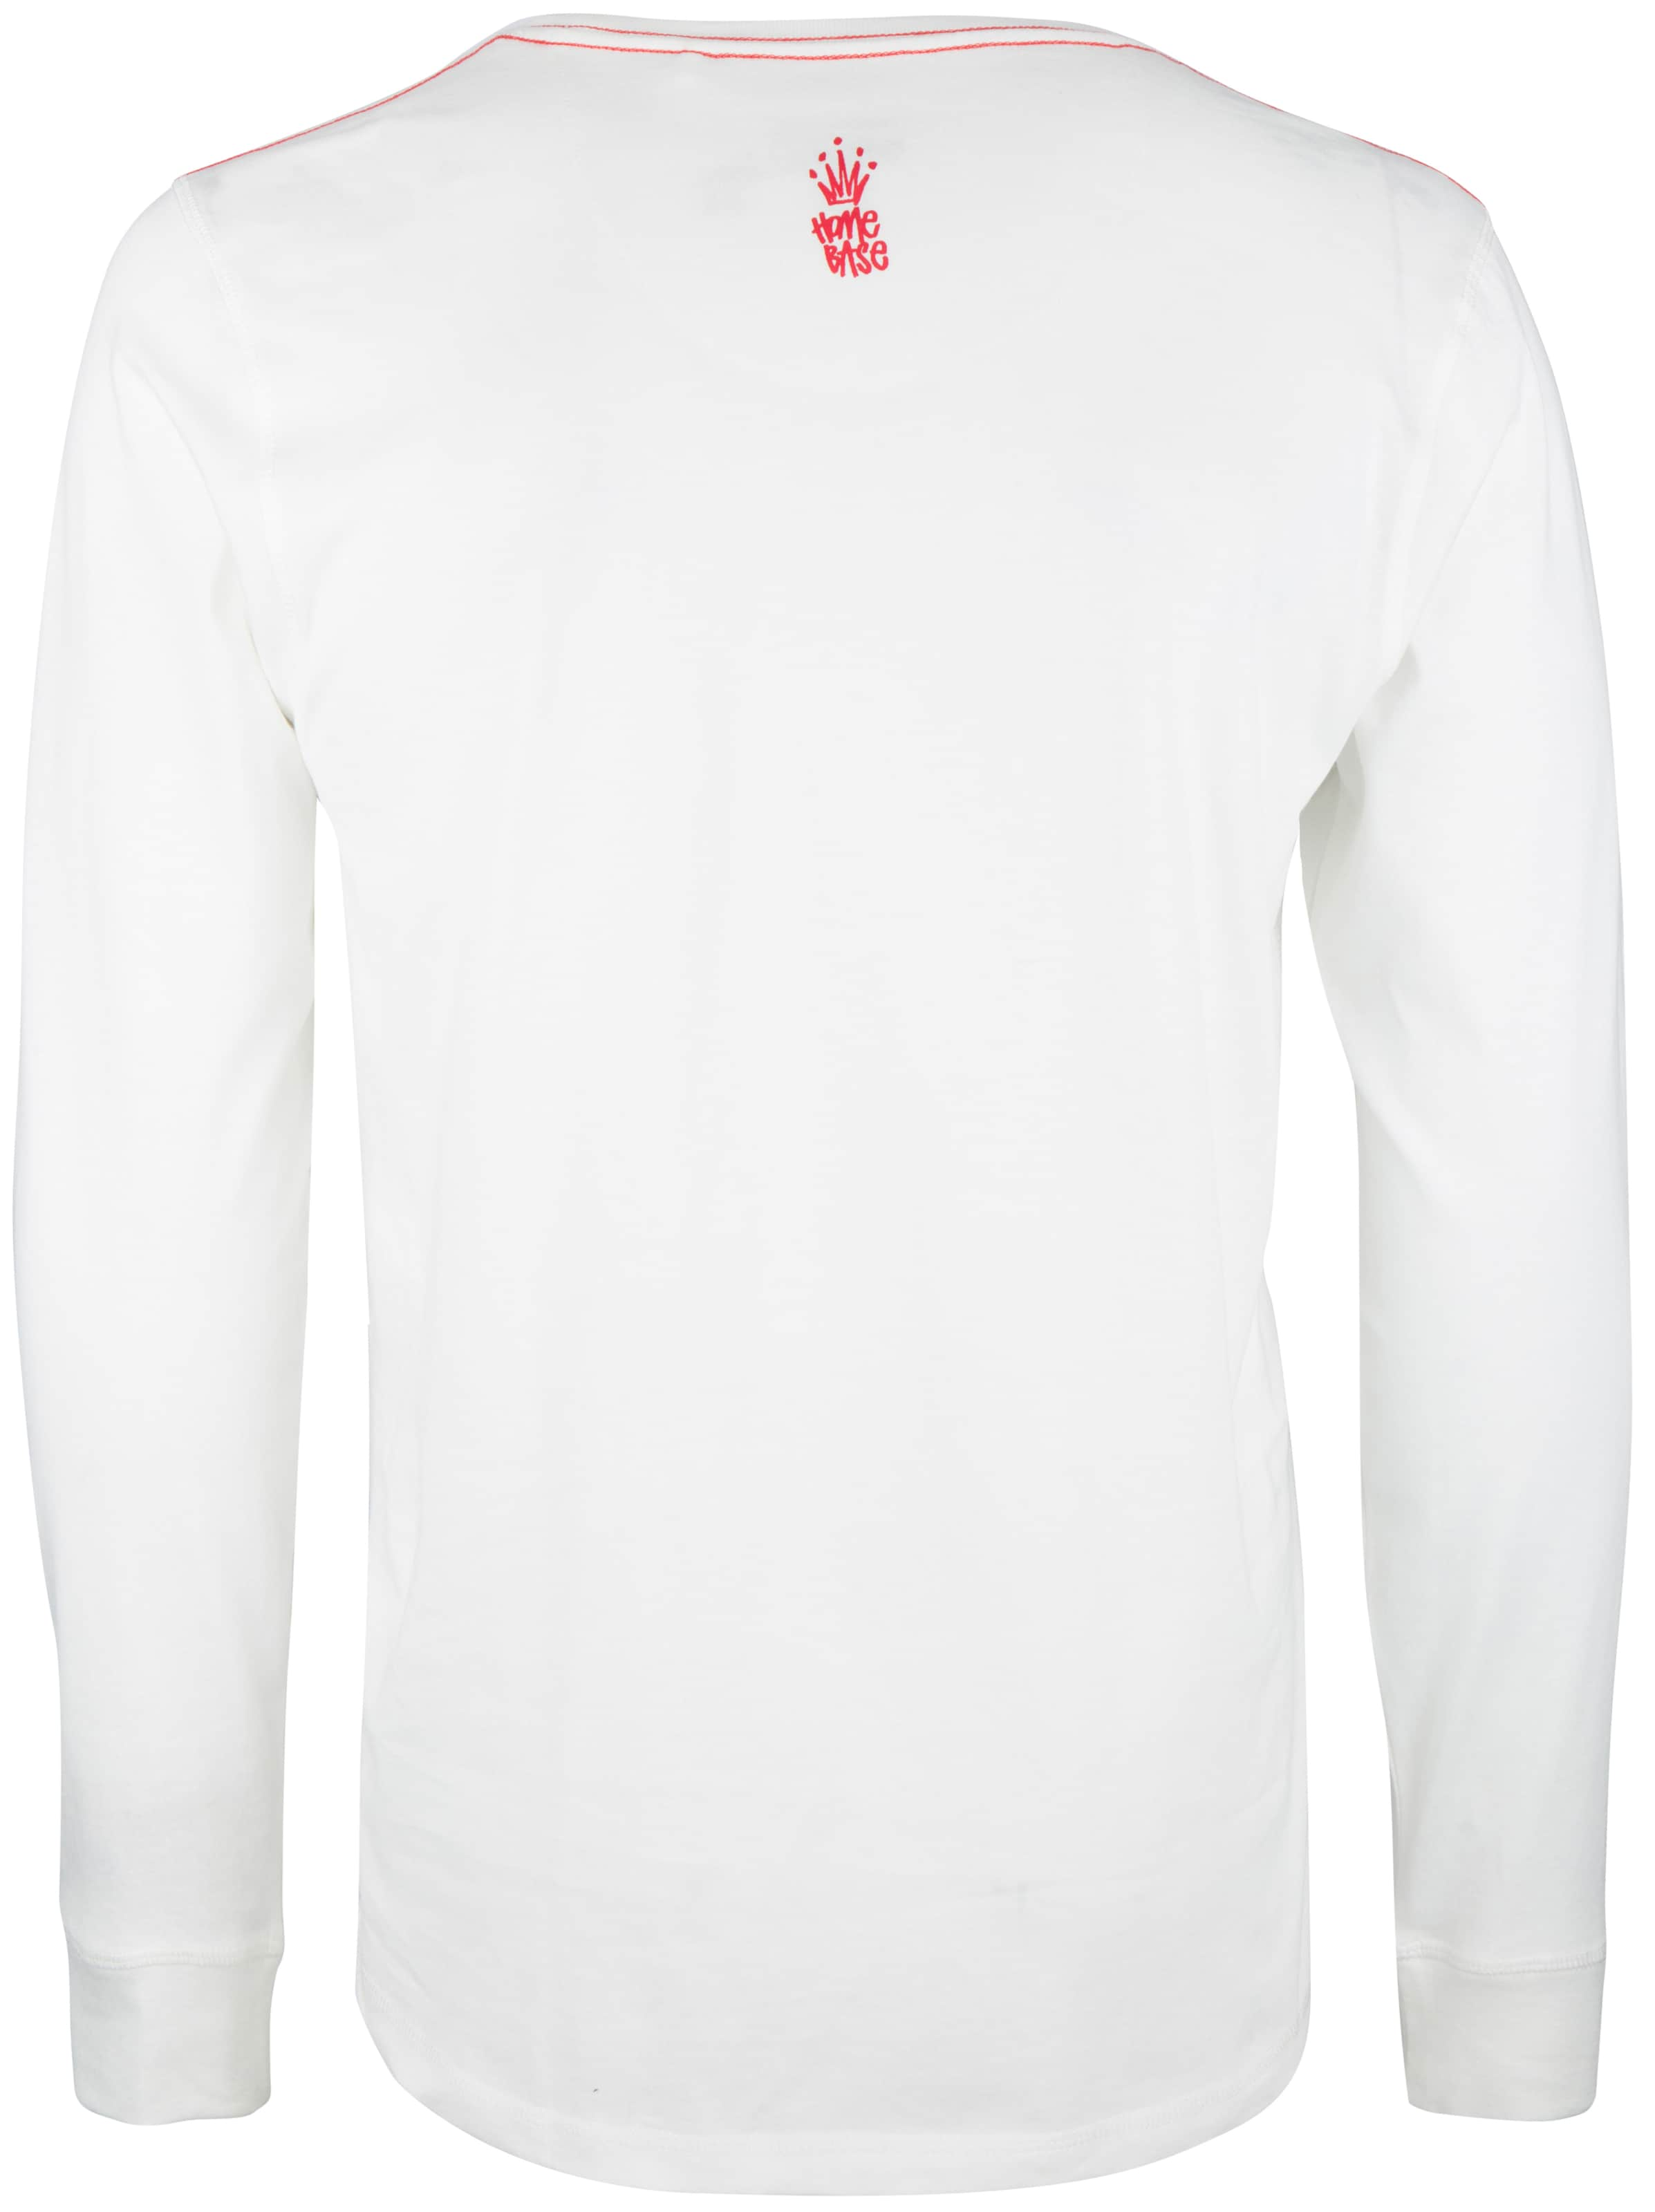 T 'brandalised BleuMarine Foncé Homebase' En shirt By Homebase reWdCxoB